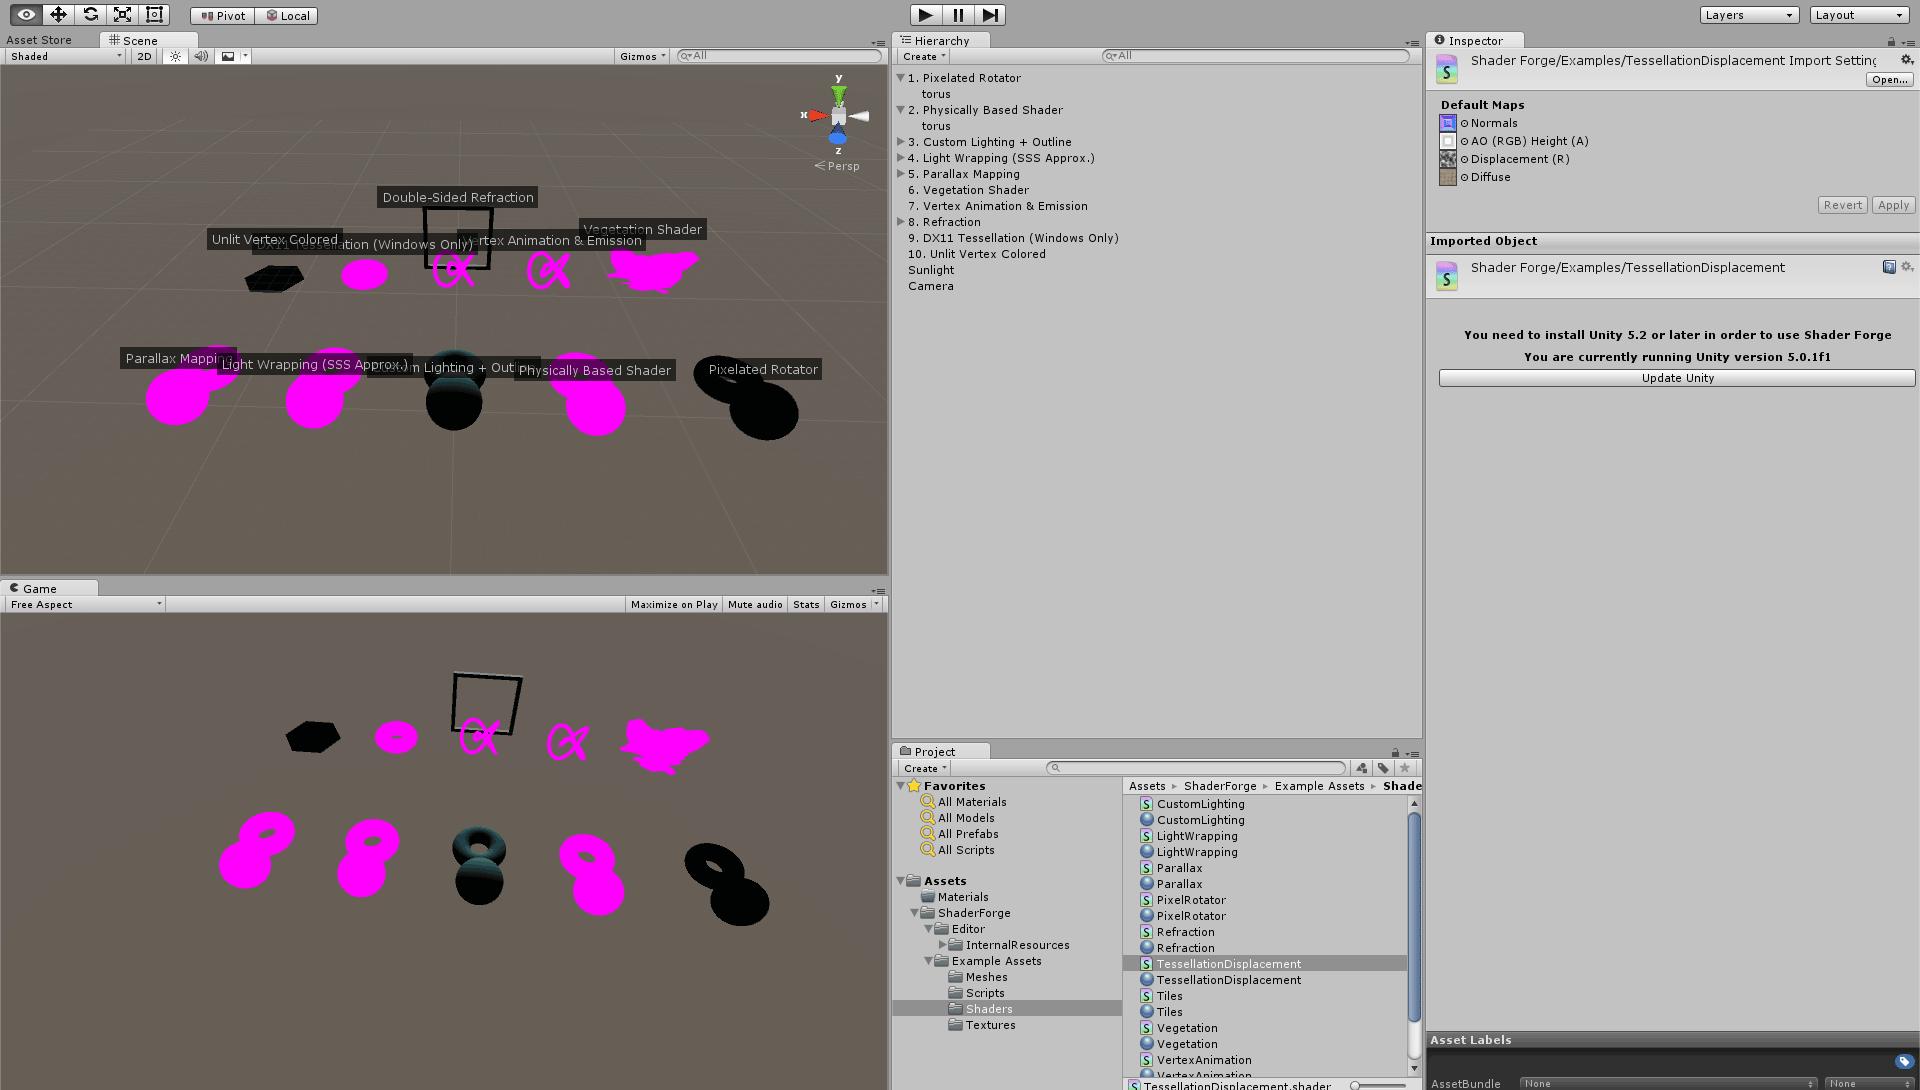 Shader Forge 1 24 in unity 5 0 1 / Feedback / Shader Forge